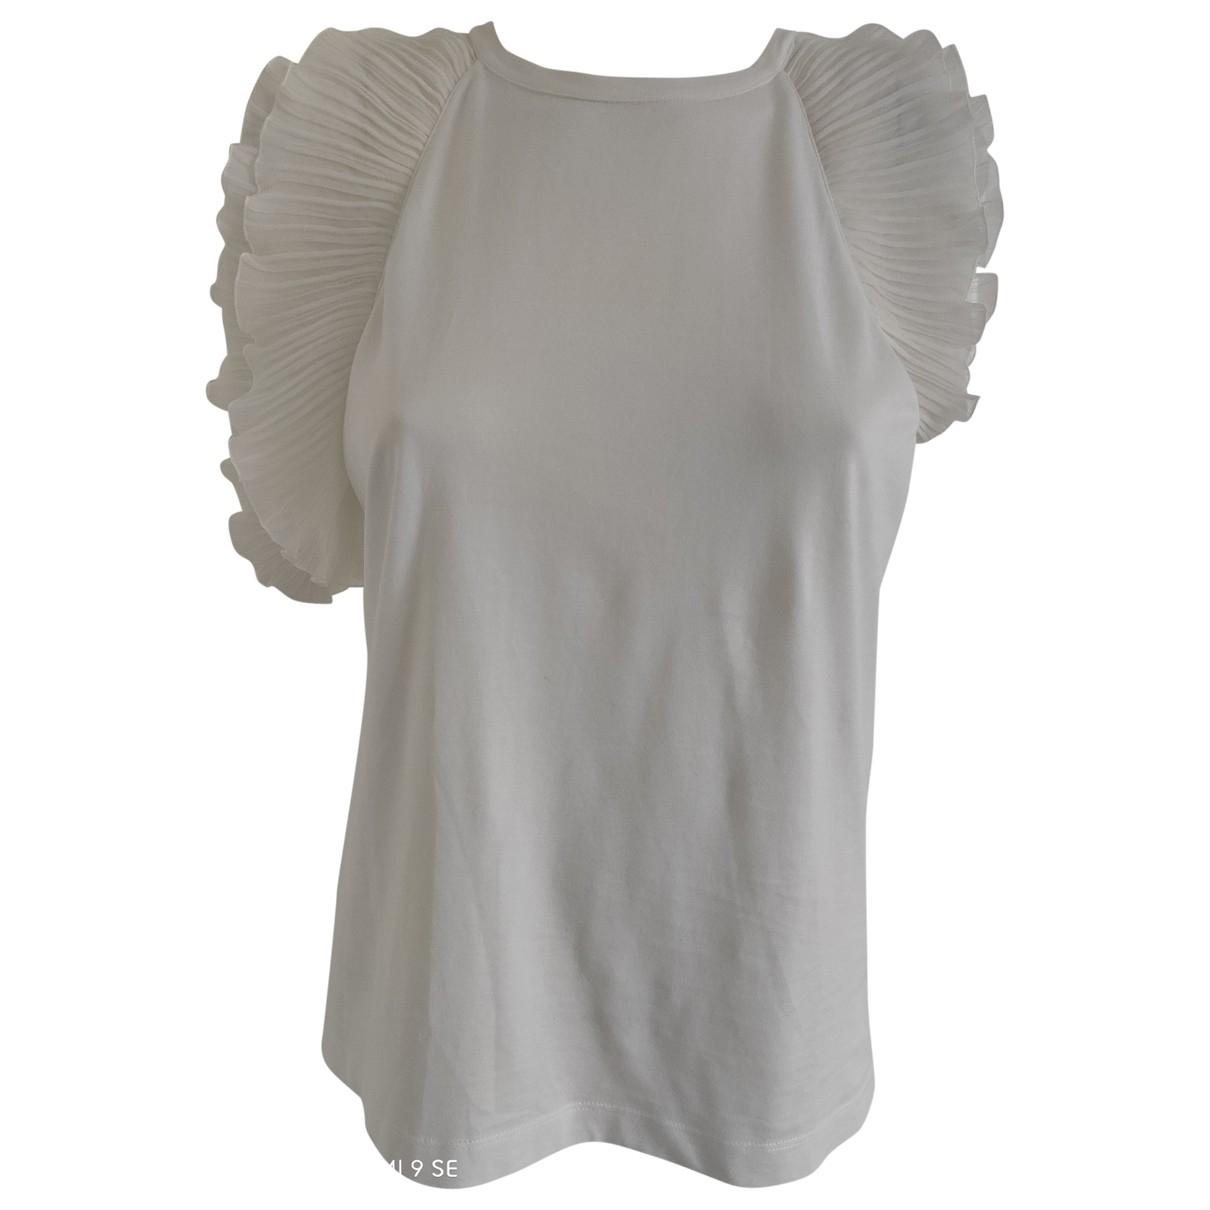 Chloé \N White Cotton  top for Women M International